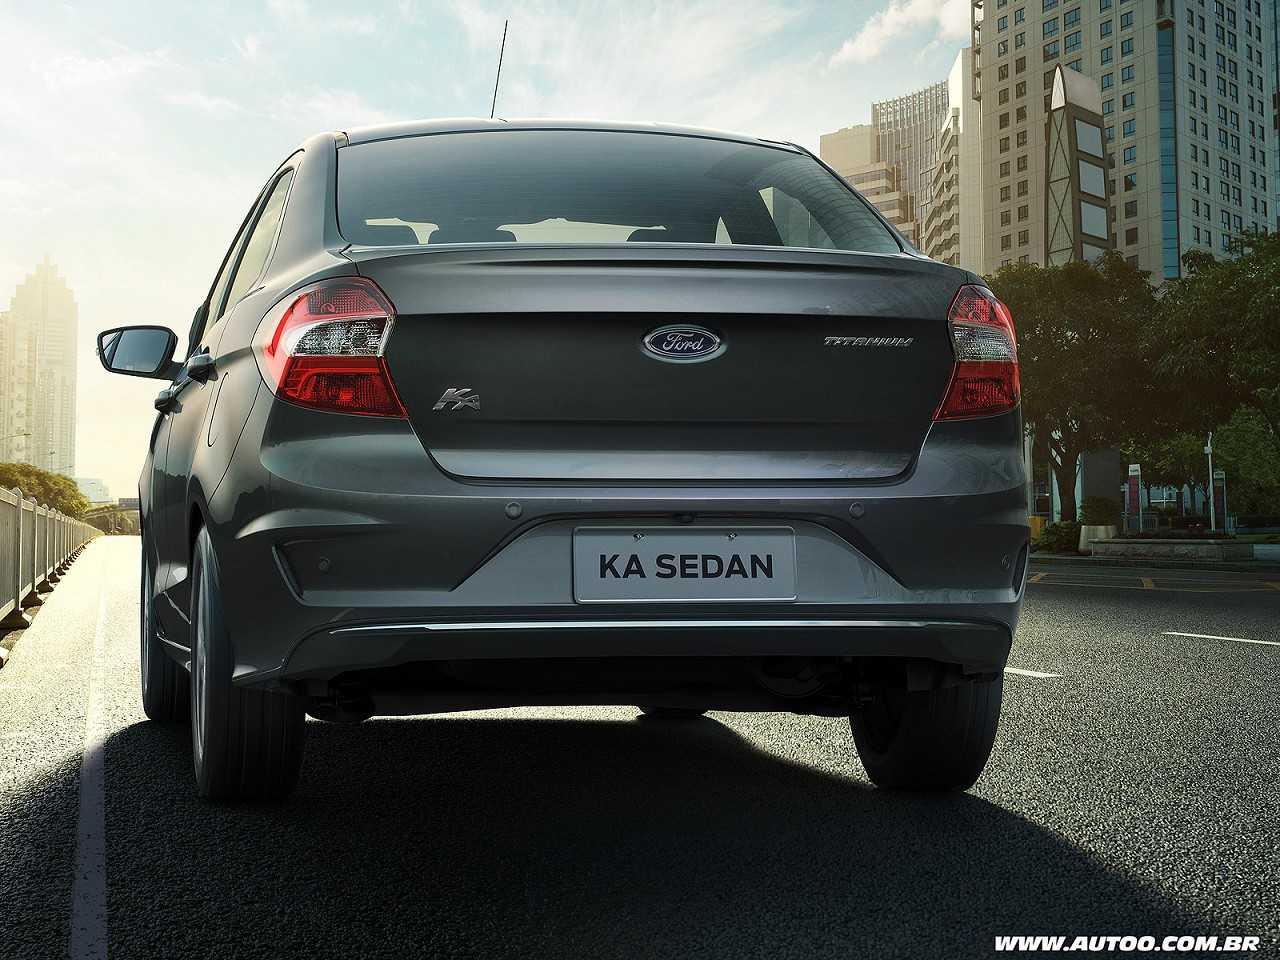 FordKa Sedan 2019 - ângulo traseiro